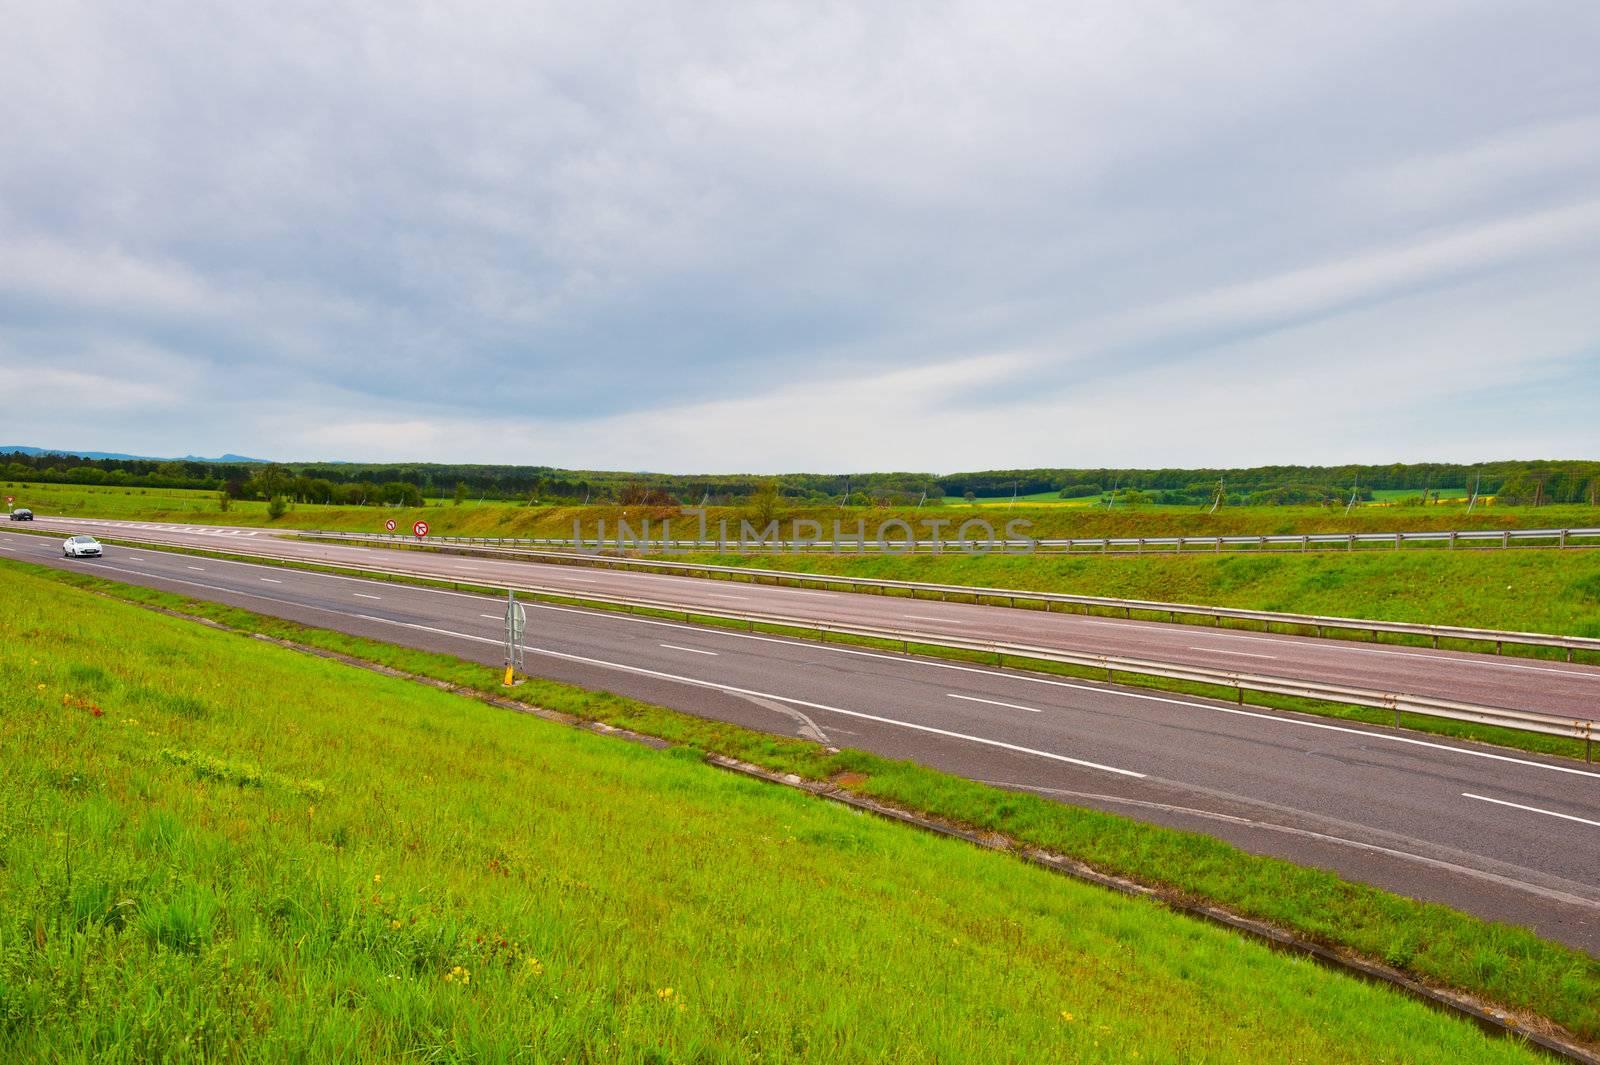 Straight Asphalt Road between Fields in Belgium